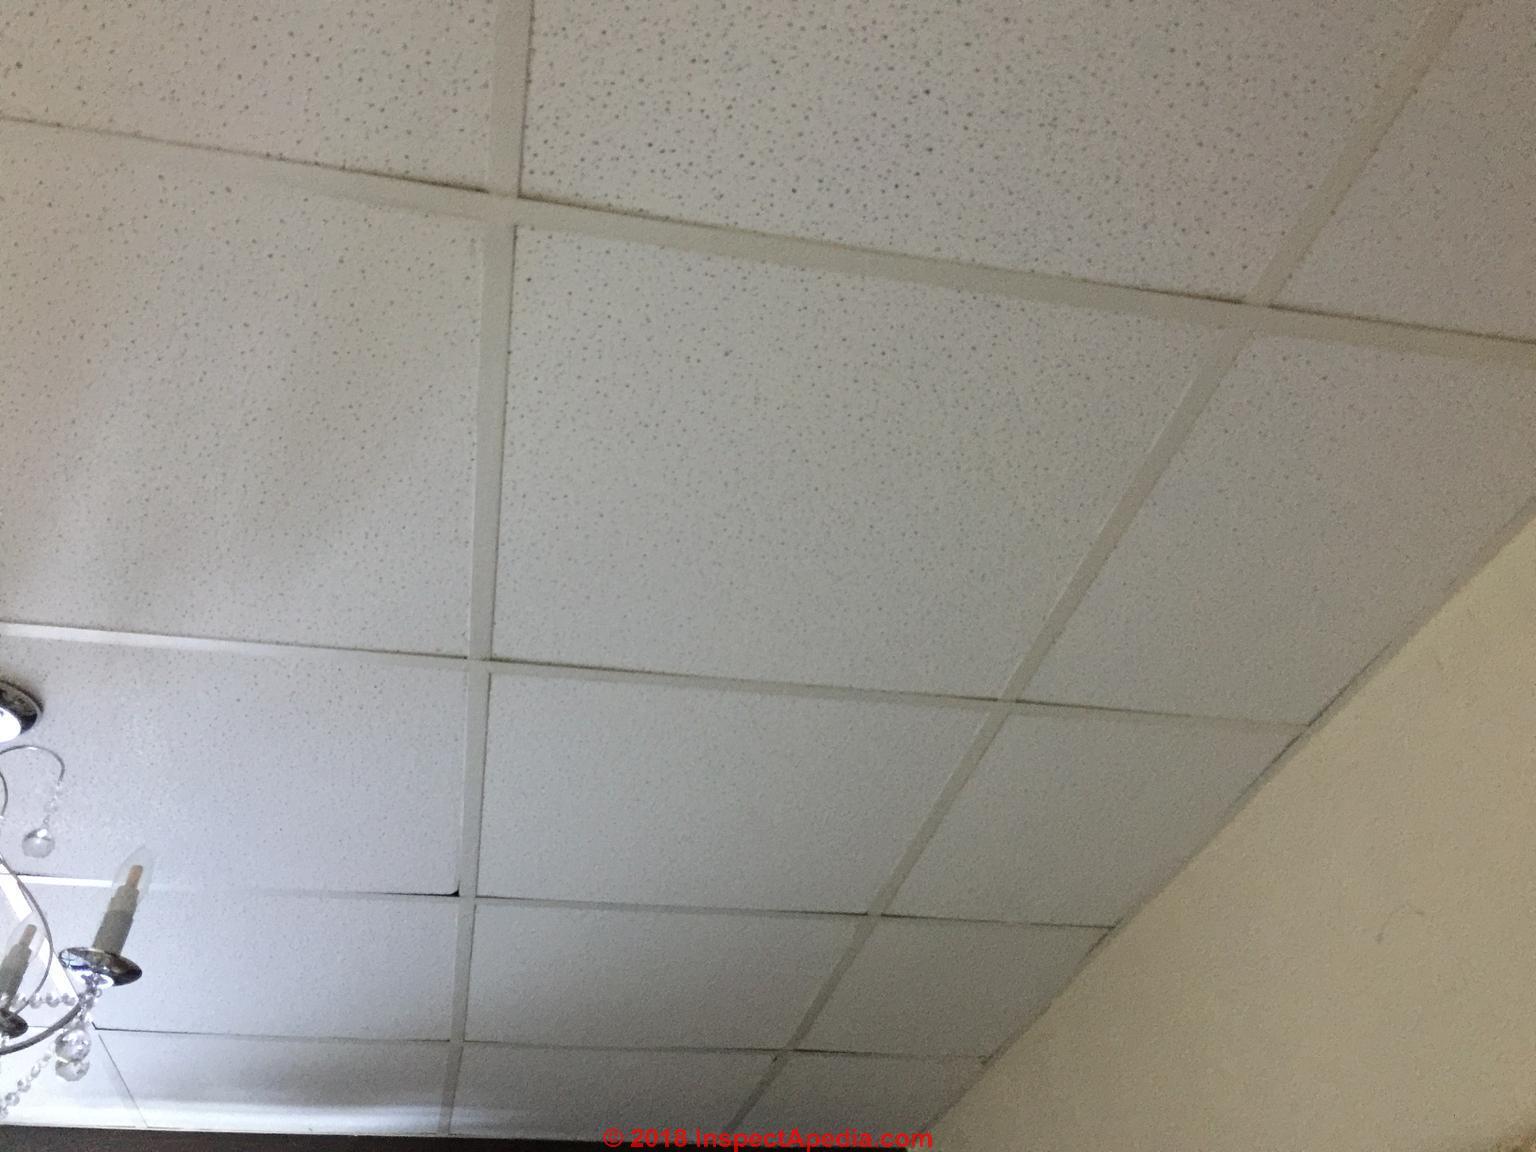 Modern Ceiling Tile 2007 Won T Contain Asbestos C Inspectapdedia Auris